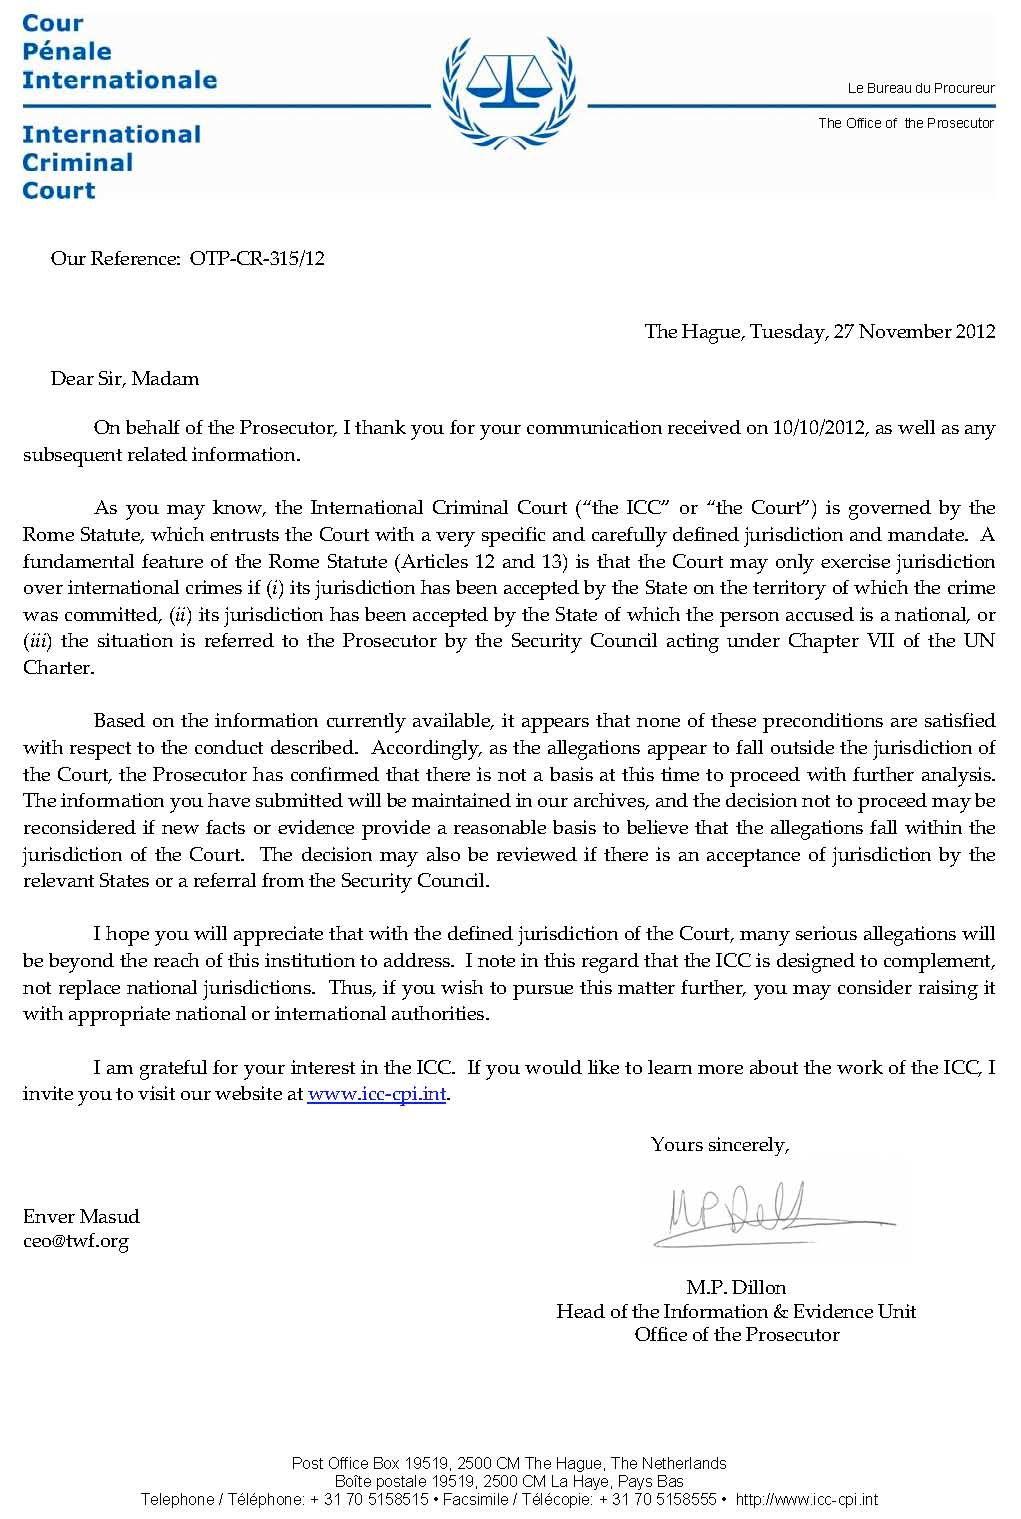 TWF_ICC_Regection_Ltr